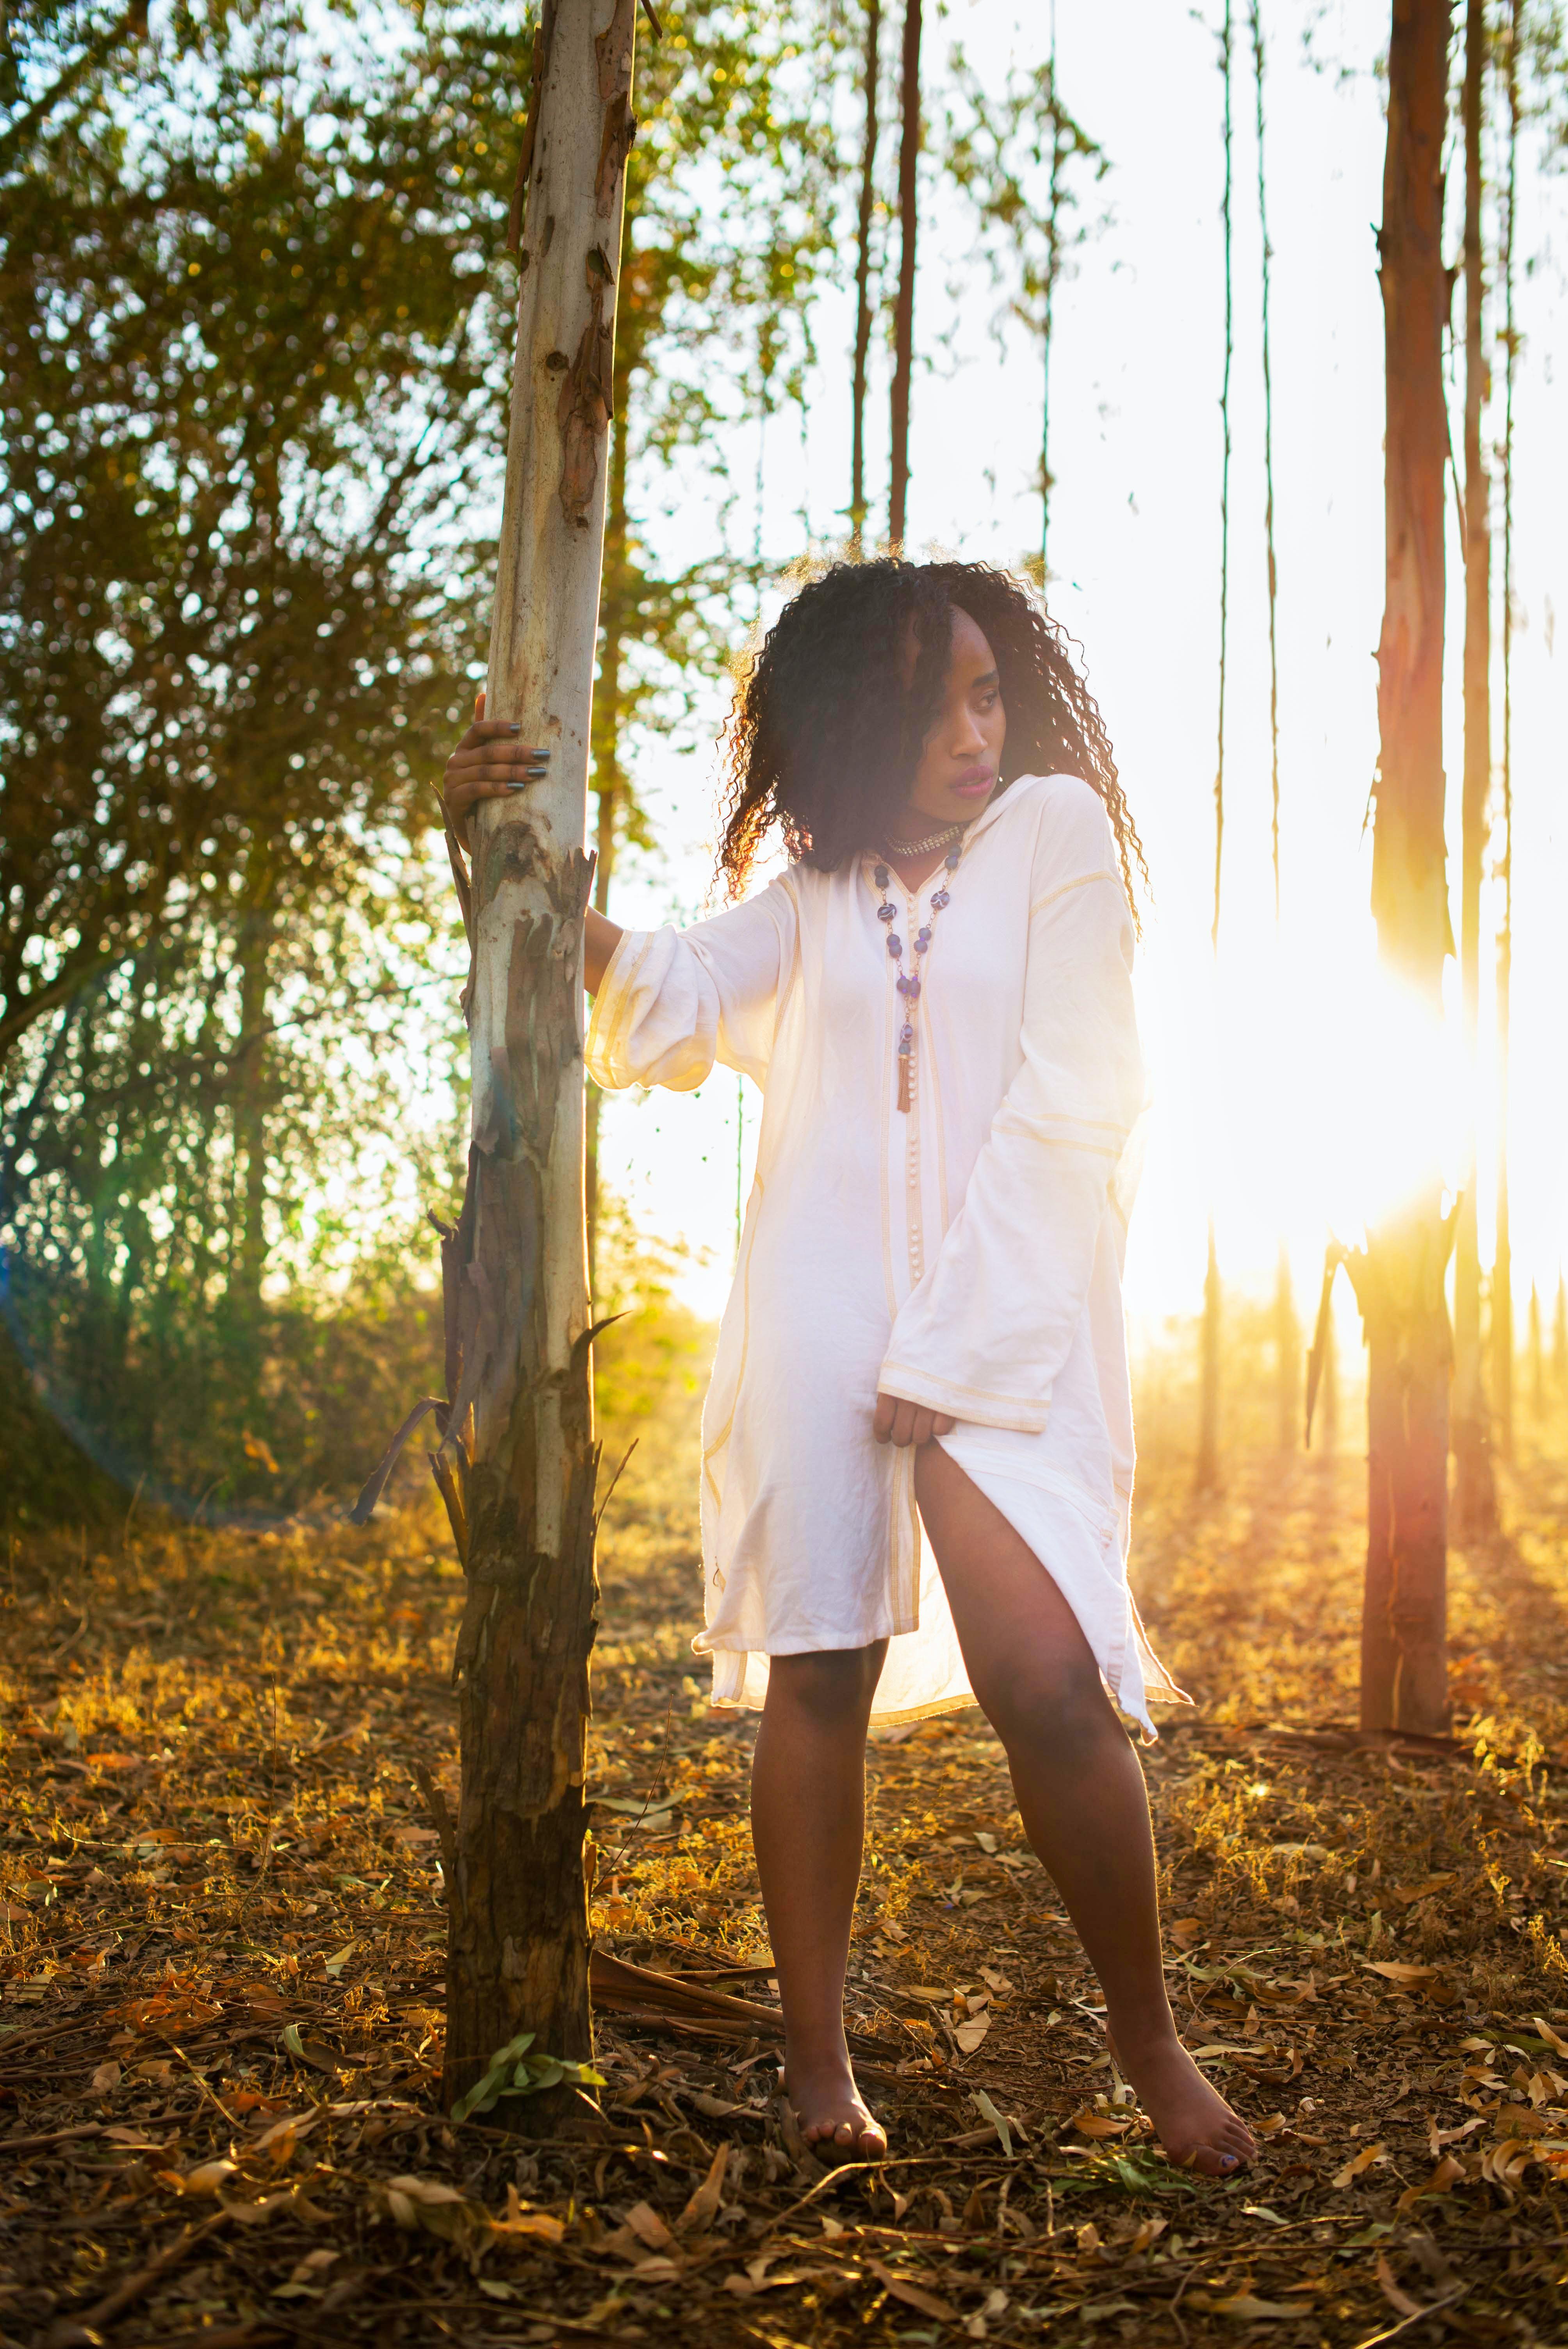 Woman Wearing Long-sleeved Shirt Standing Beside Tree